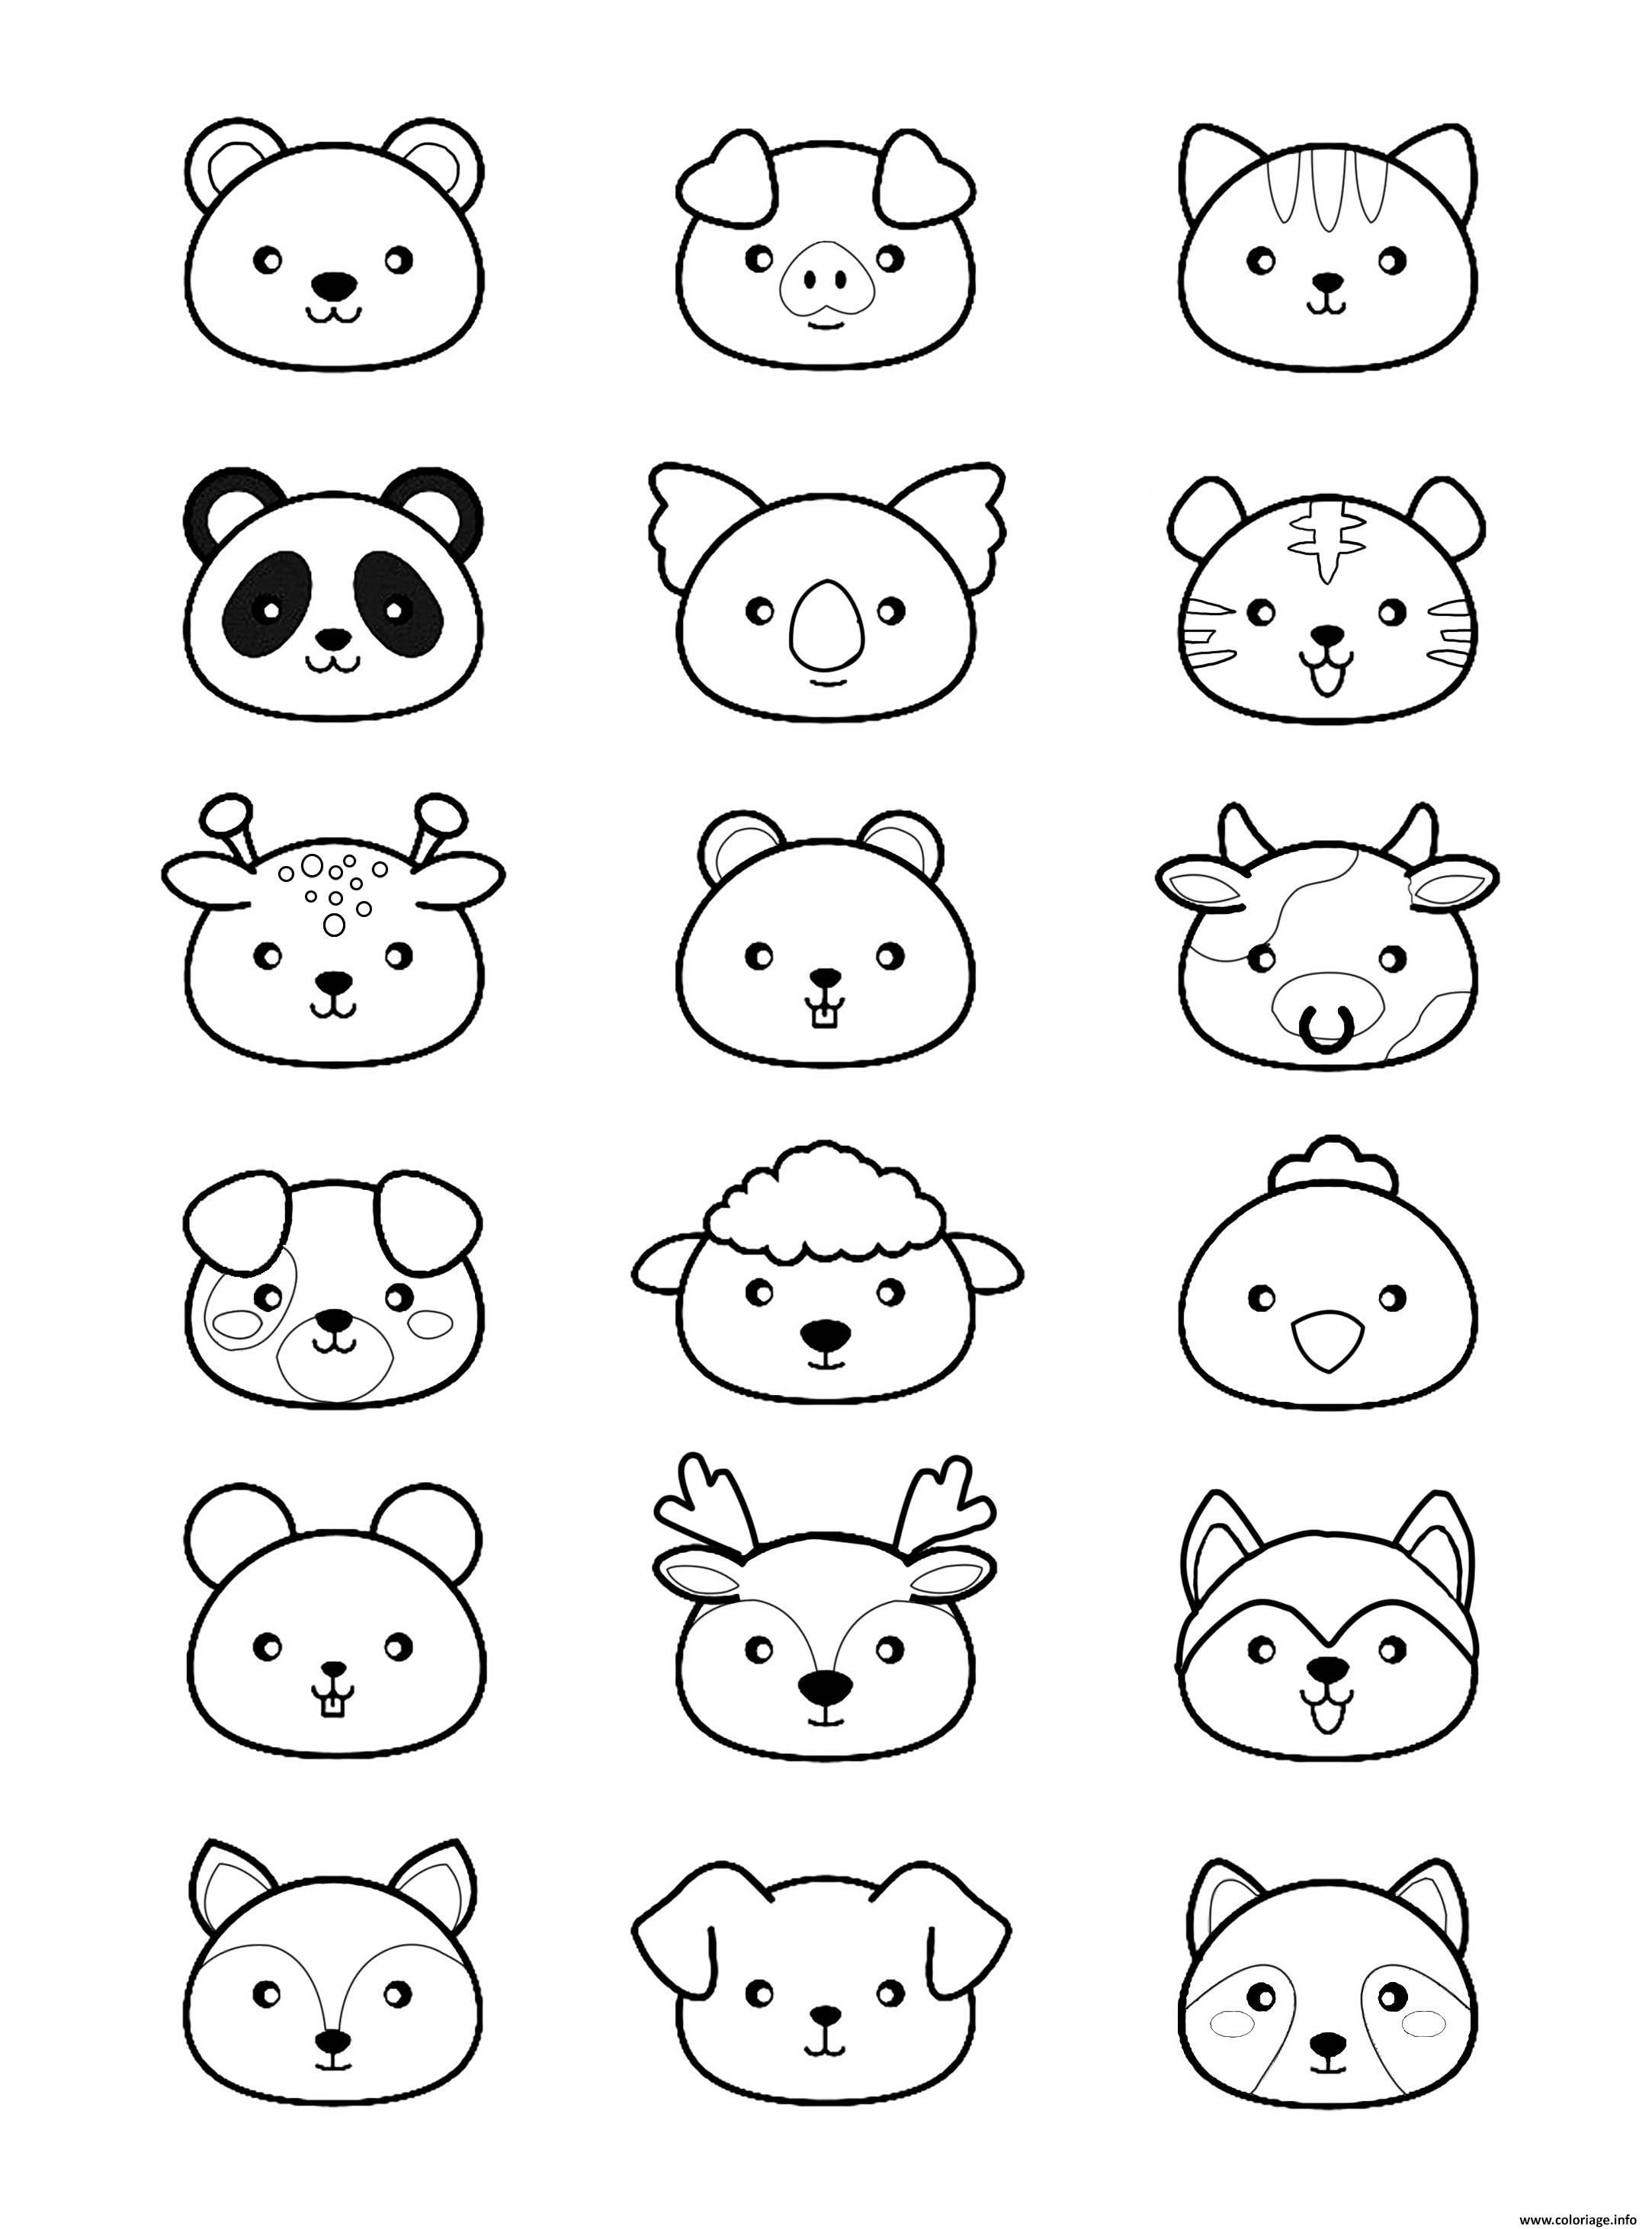 Fun Emoji Coloring Pages Printable 101 Coloring